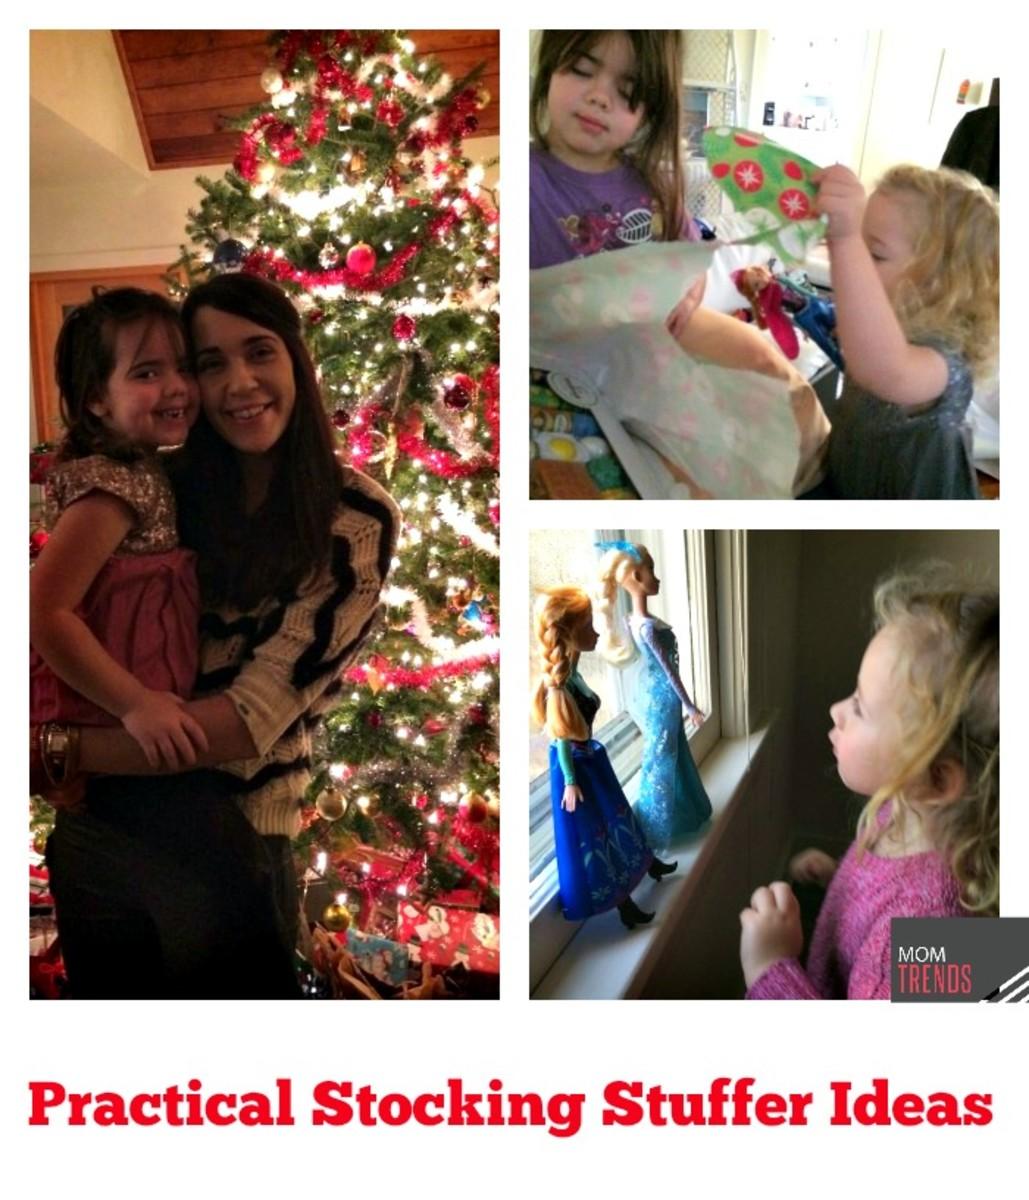 Practical Stocking Stuffer Ideas